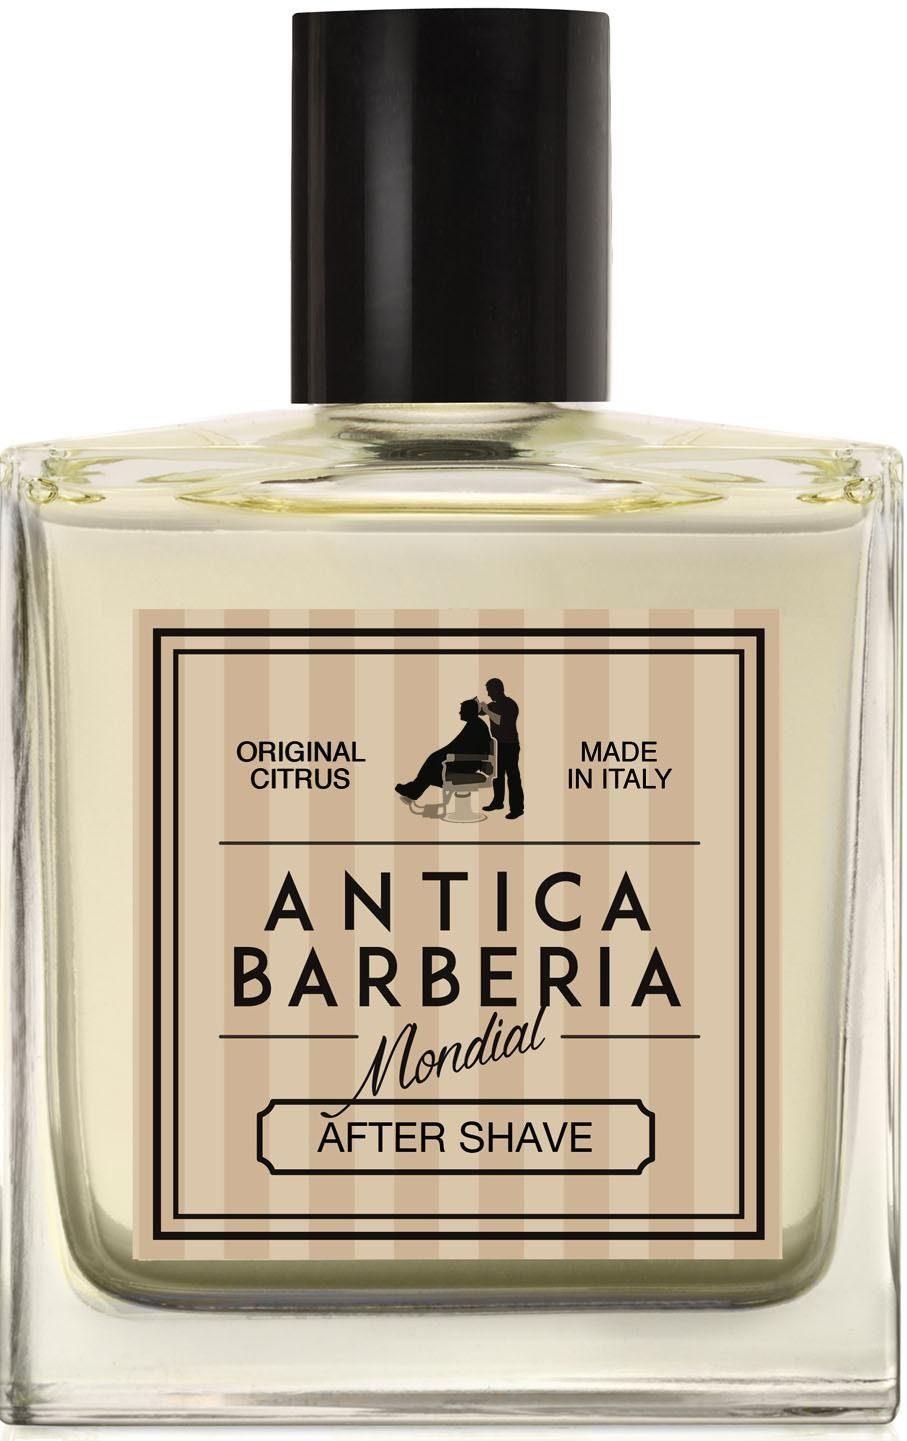 Mondial Antica Barberia, »Aftershave Lotion Original Citrus«, Aftershave